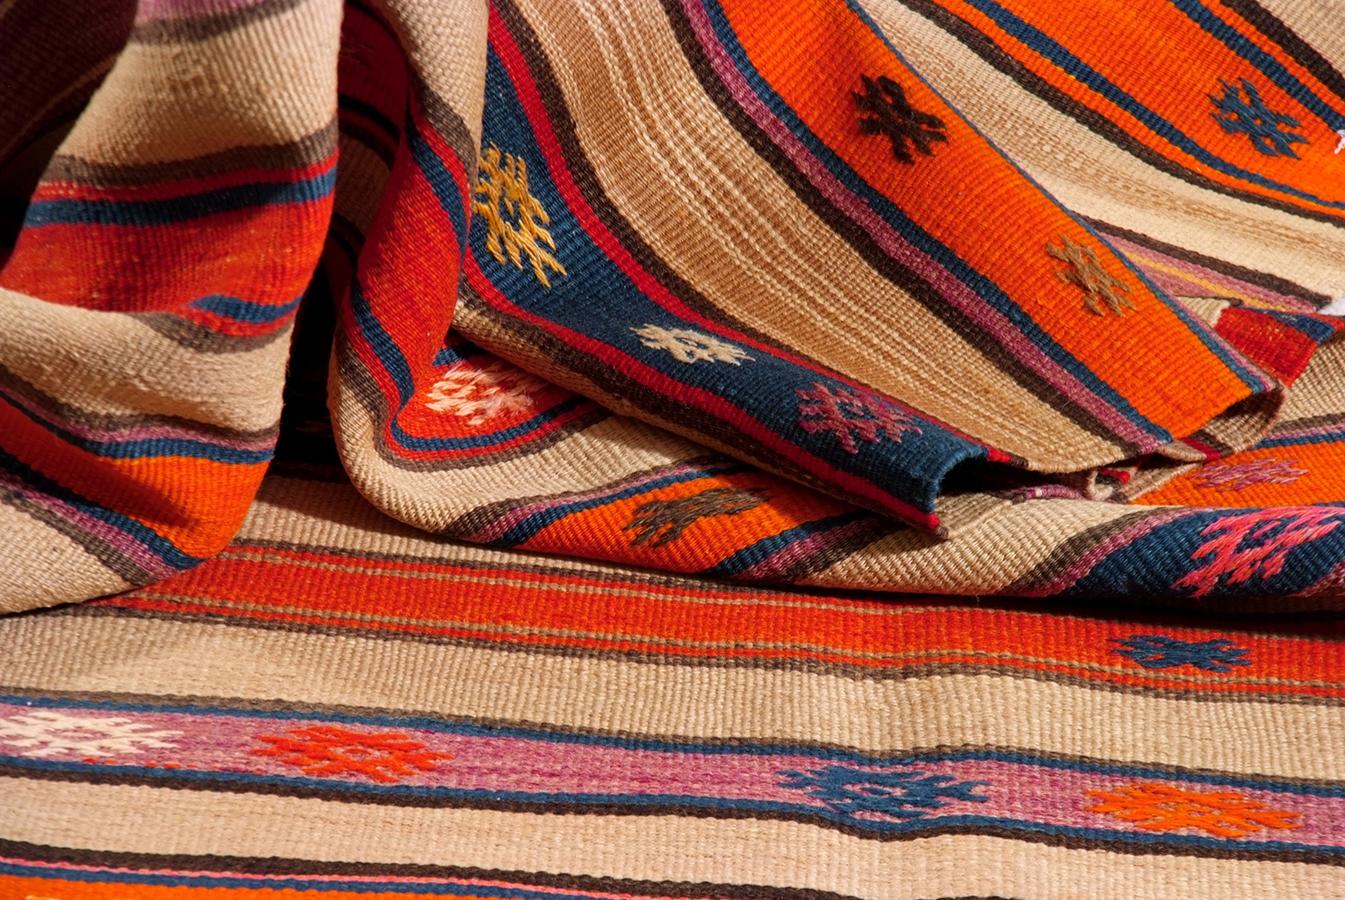 Tappeti Kilim Moderni : Tappeto kilim turco moderno decorativo senape etsy